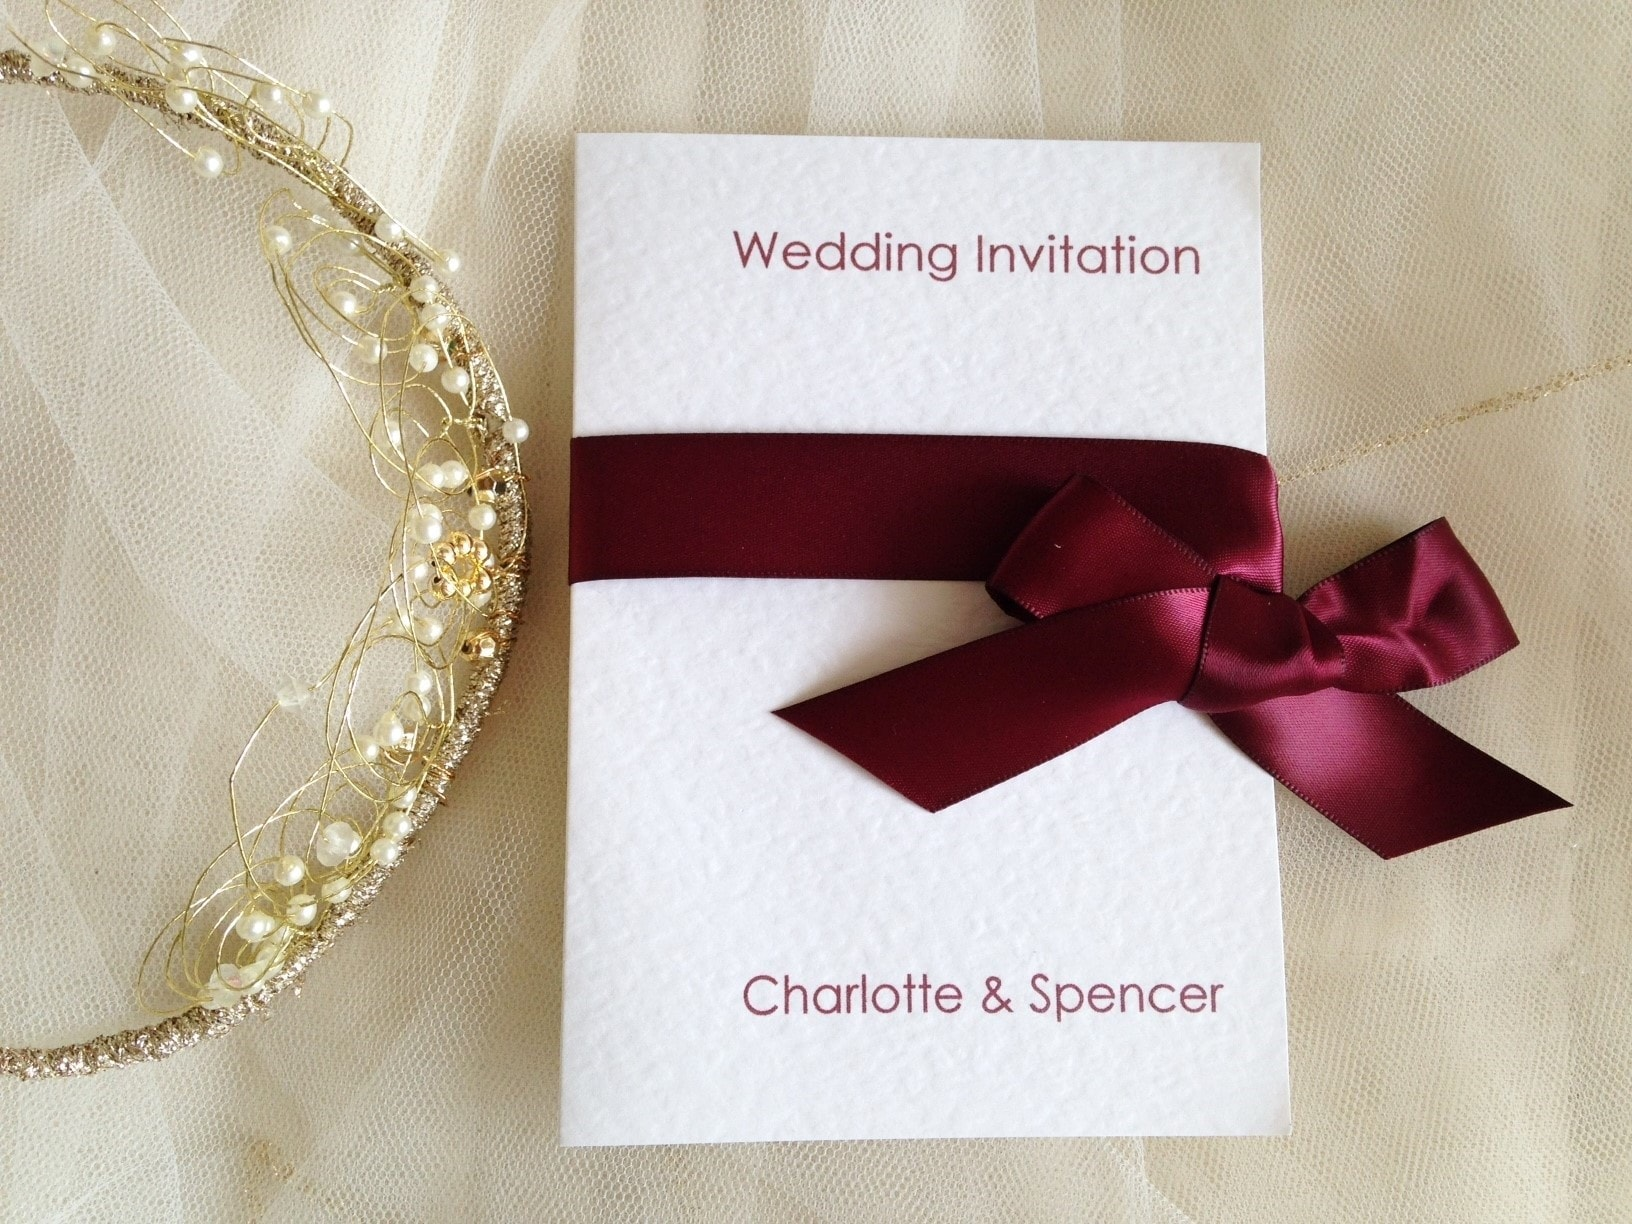 vineyard wedding invitations uk - 28 images - vineyard wedding ...